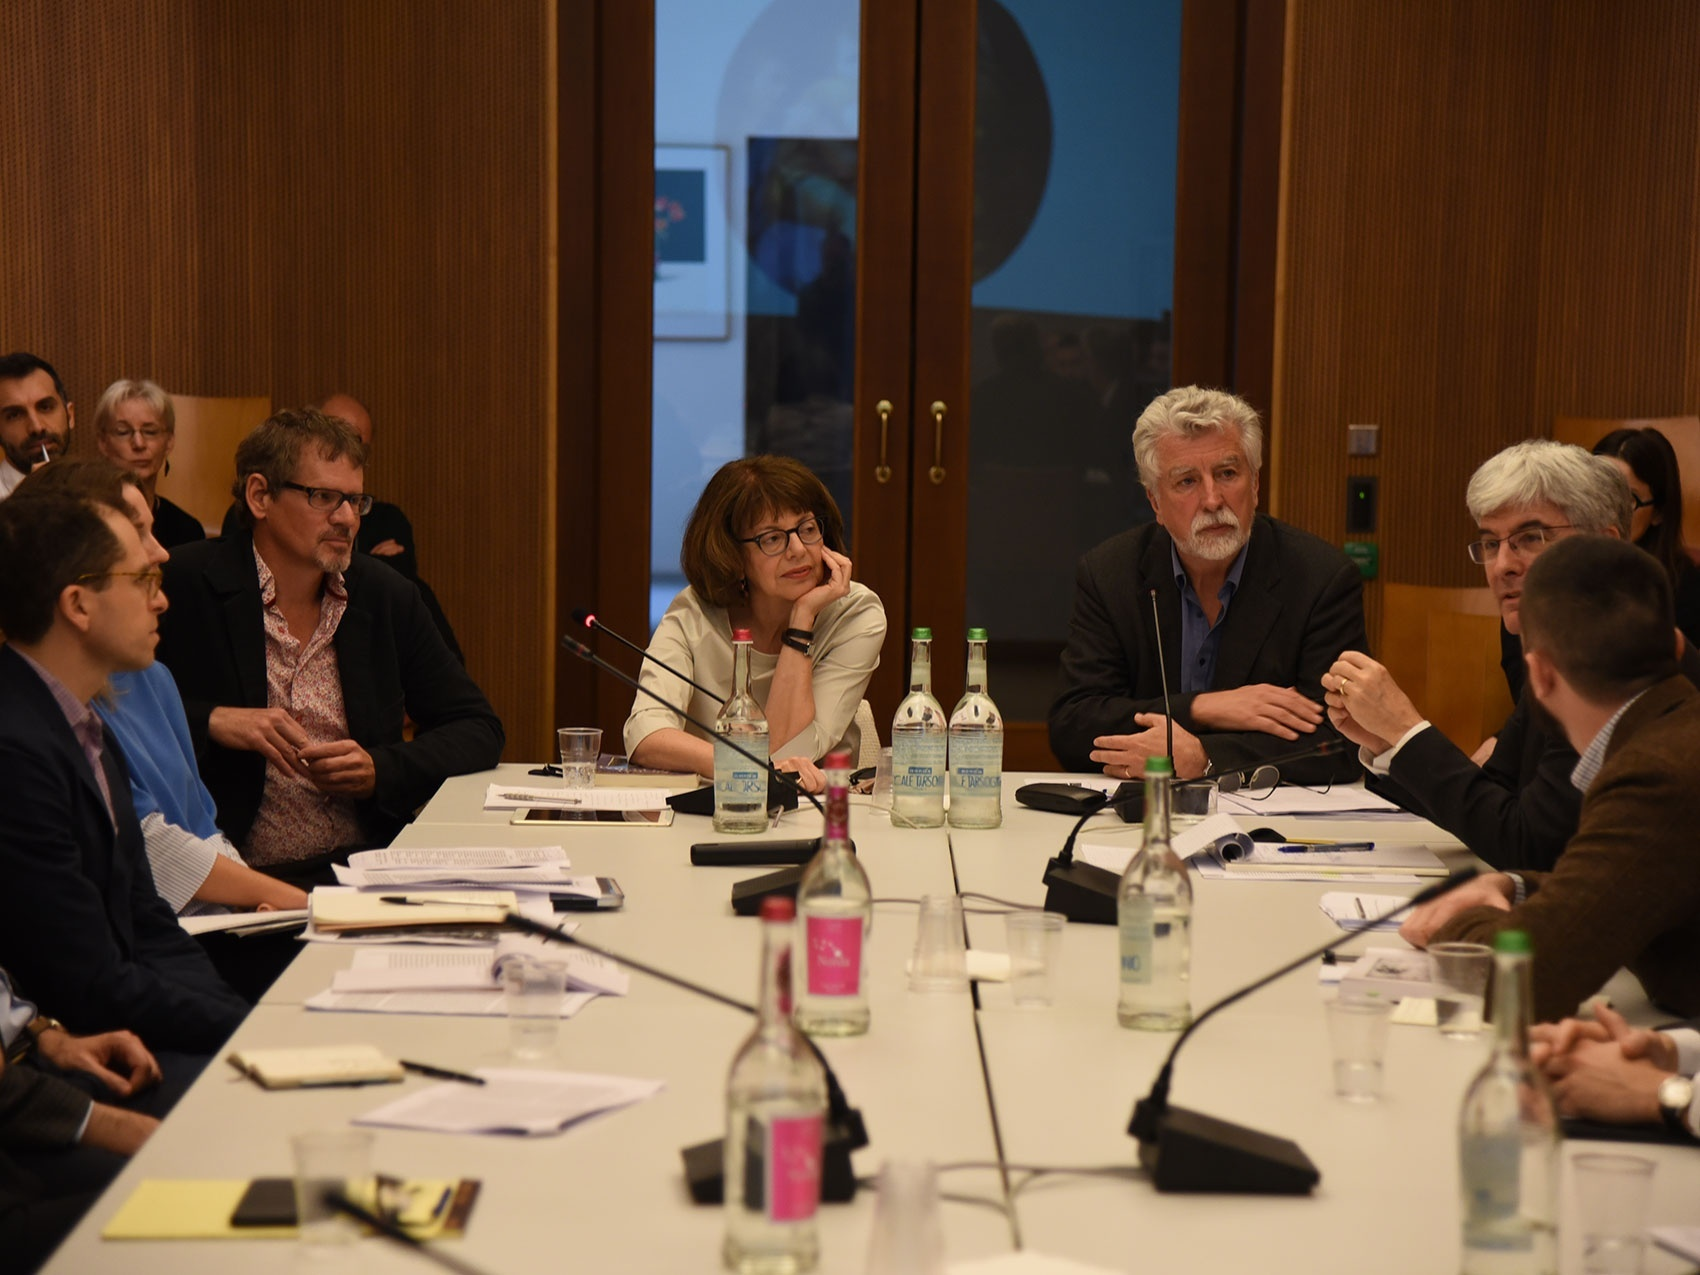 Director Alina Payne and Professor Victor Stoichita during a conference at I Tatti